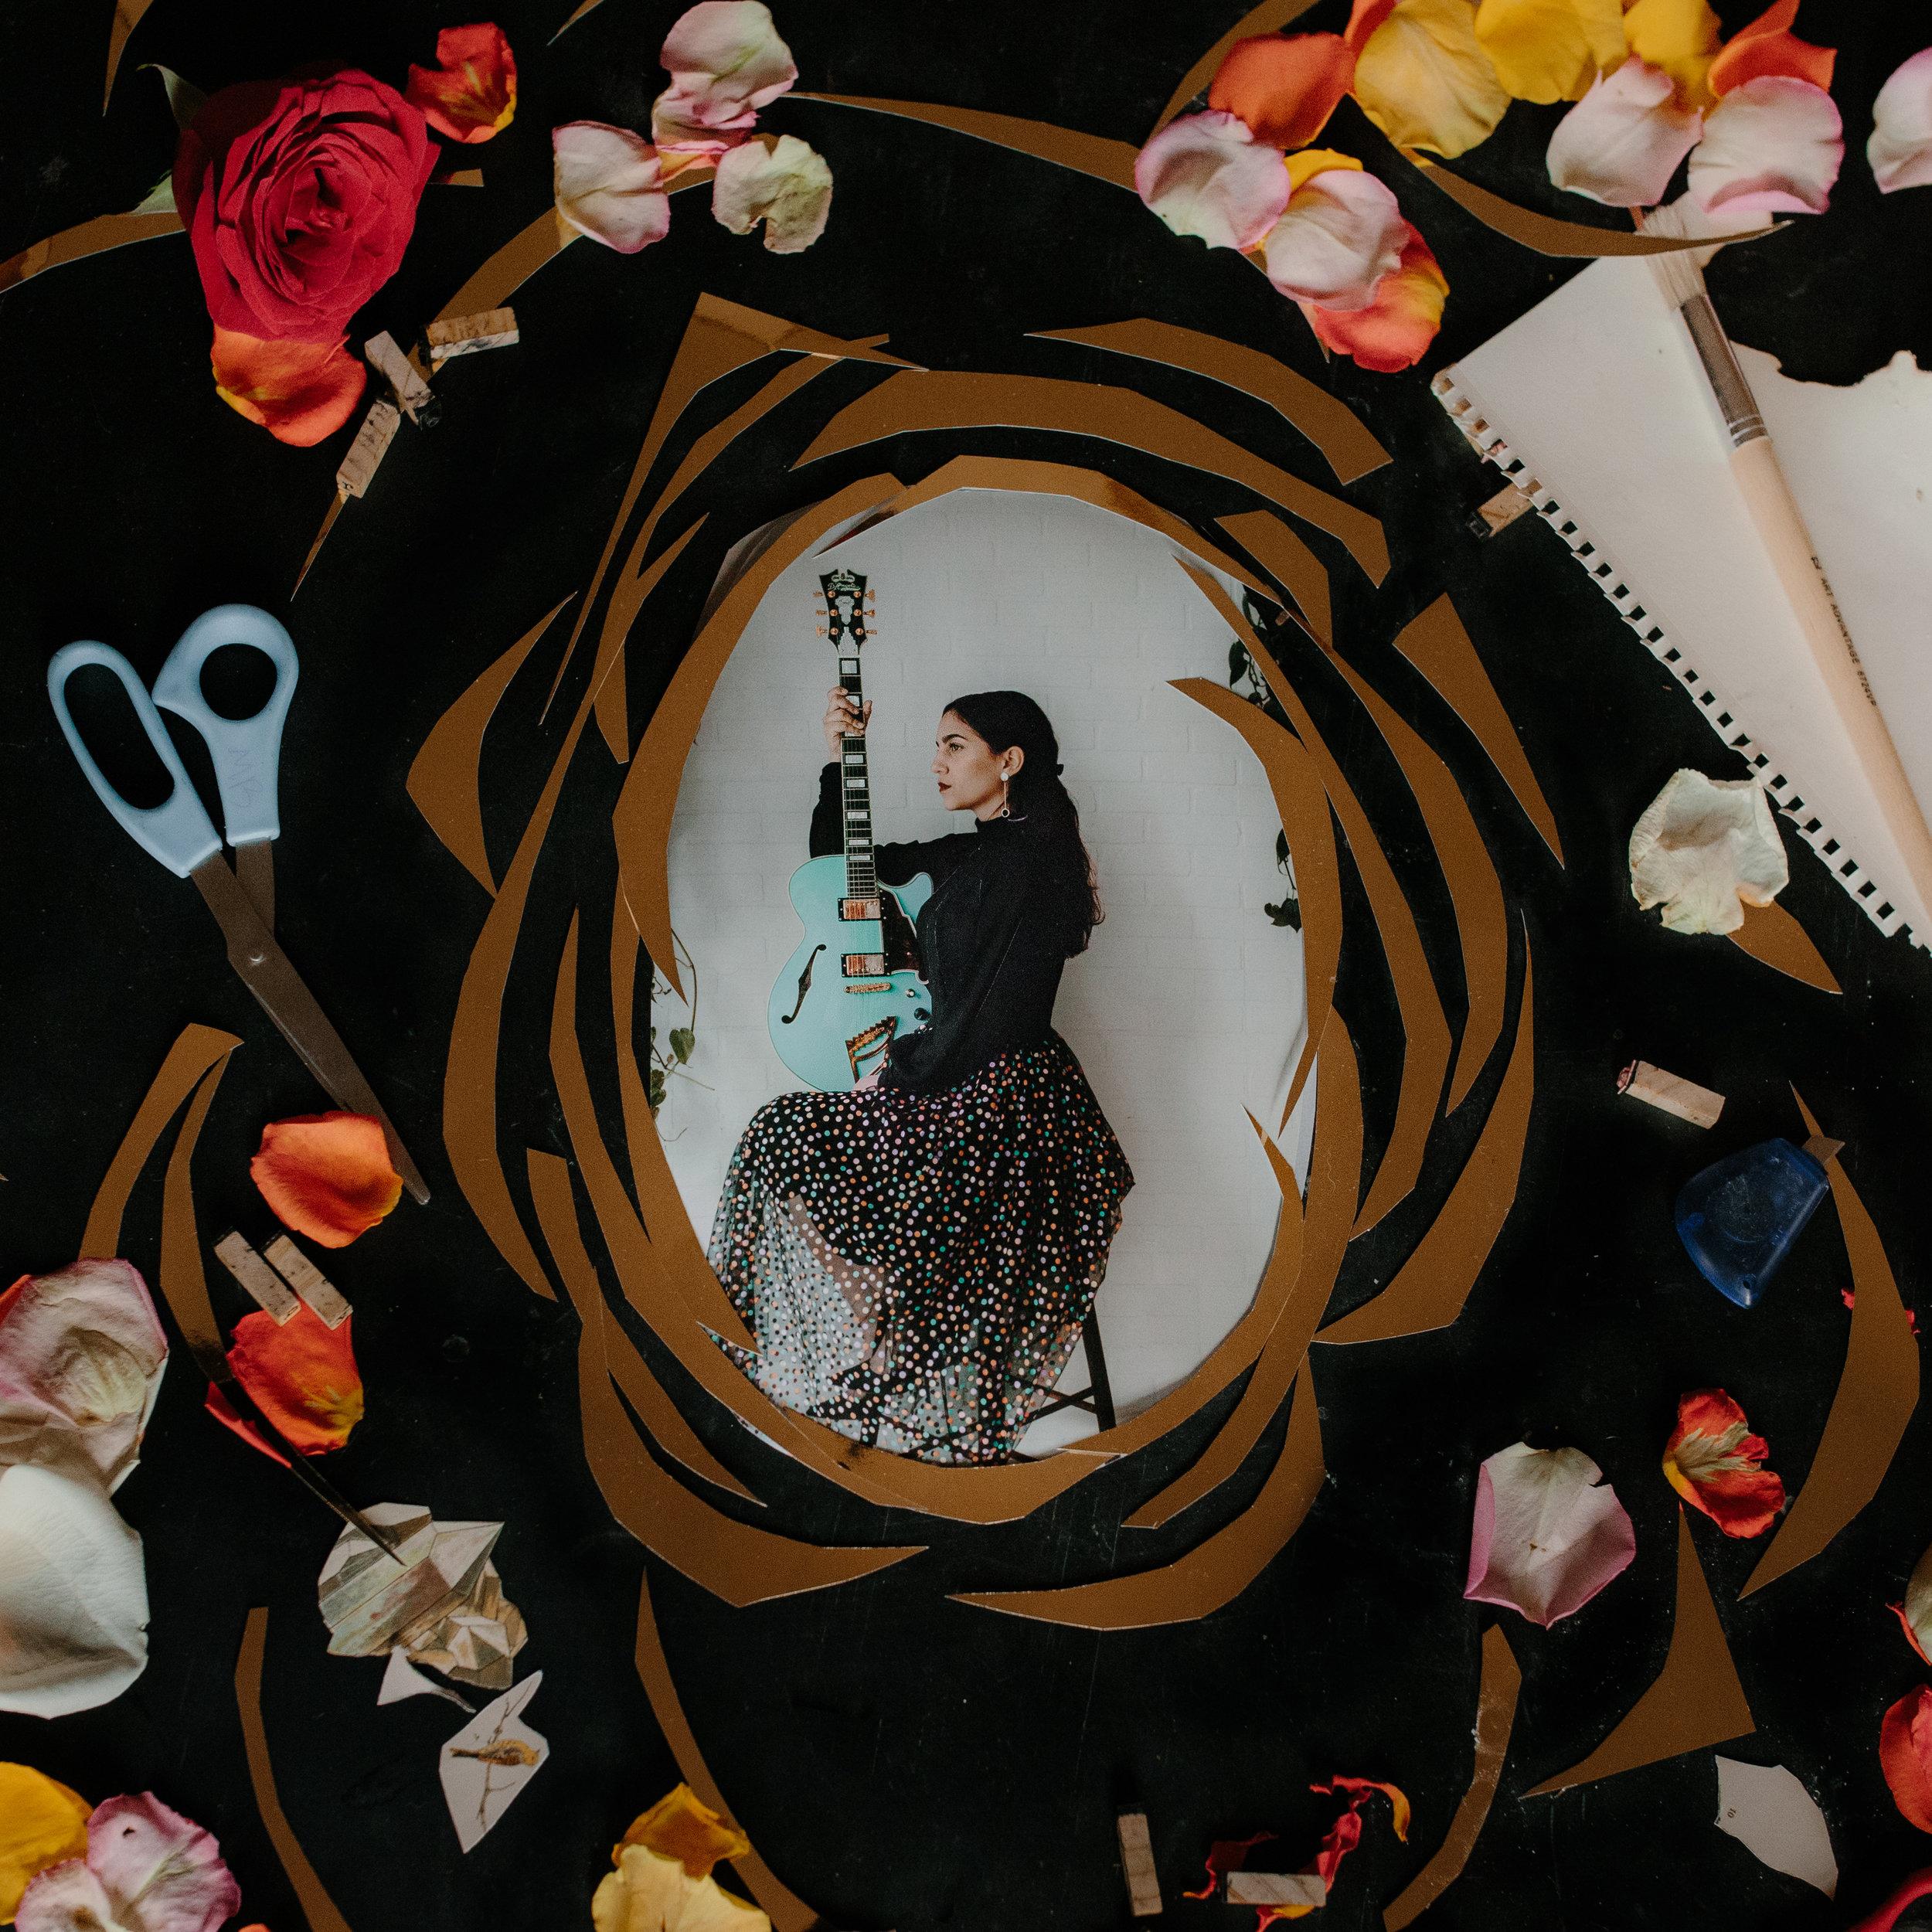 sabrina-album-cover-crop-1.jpg